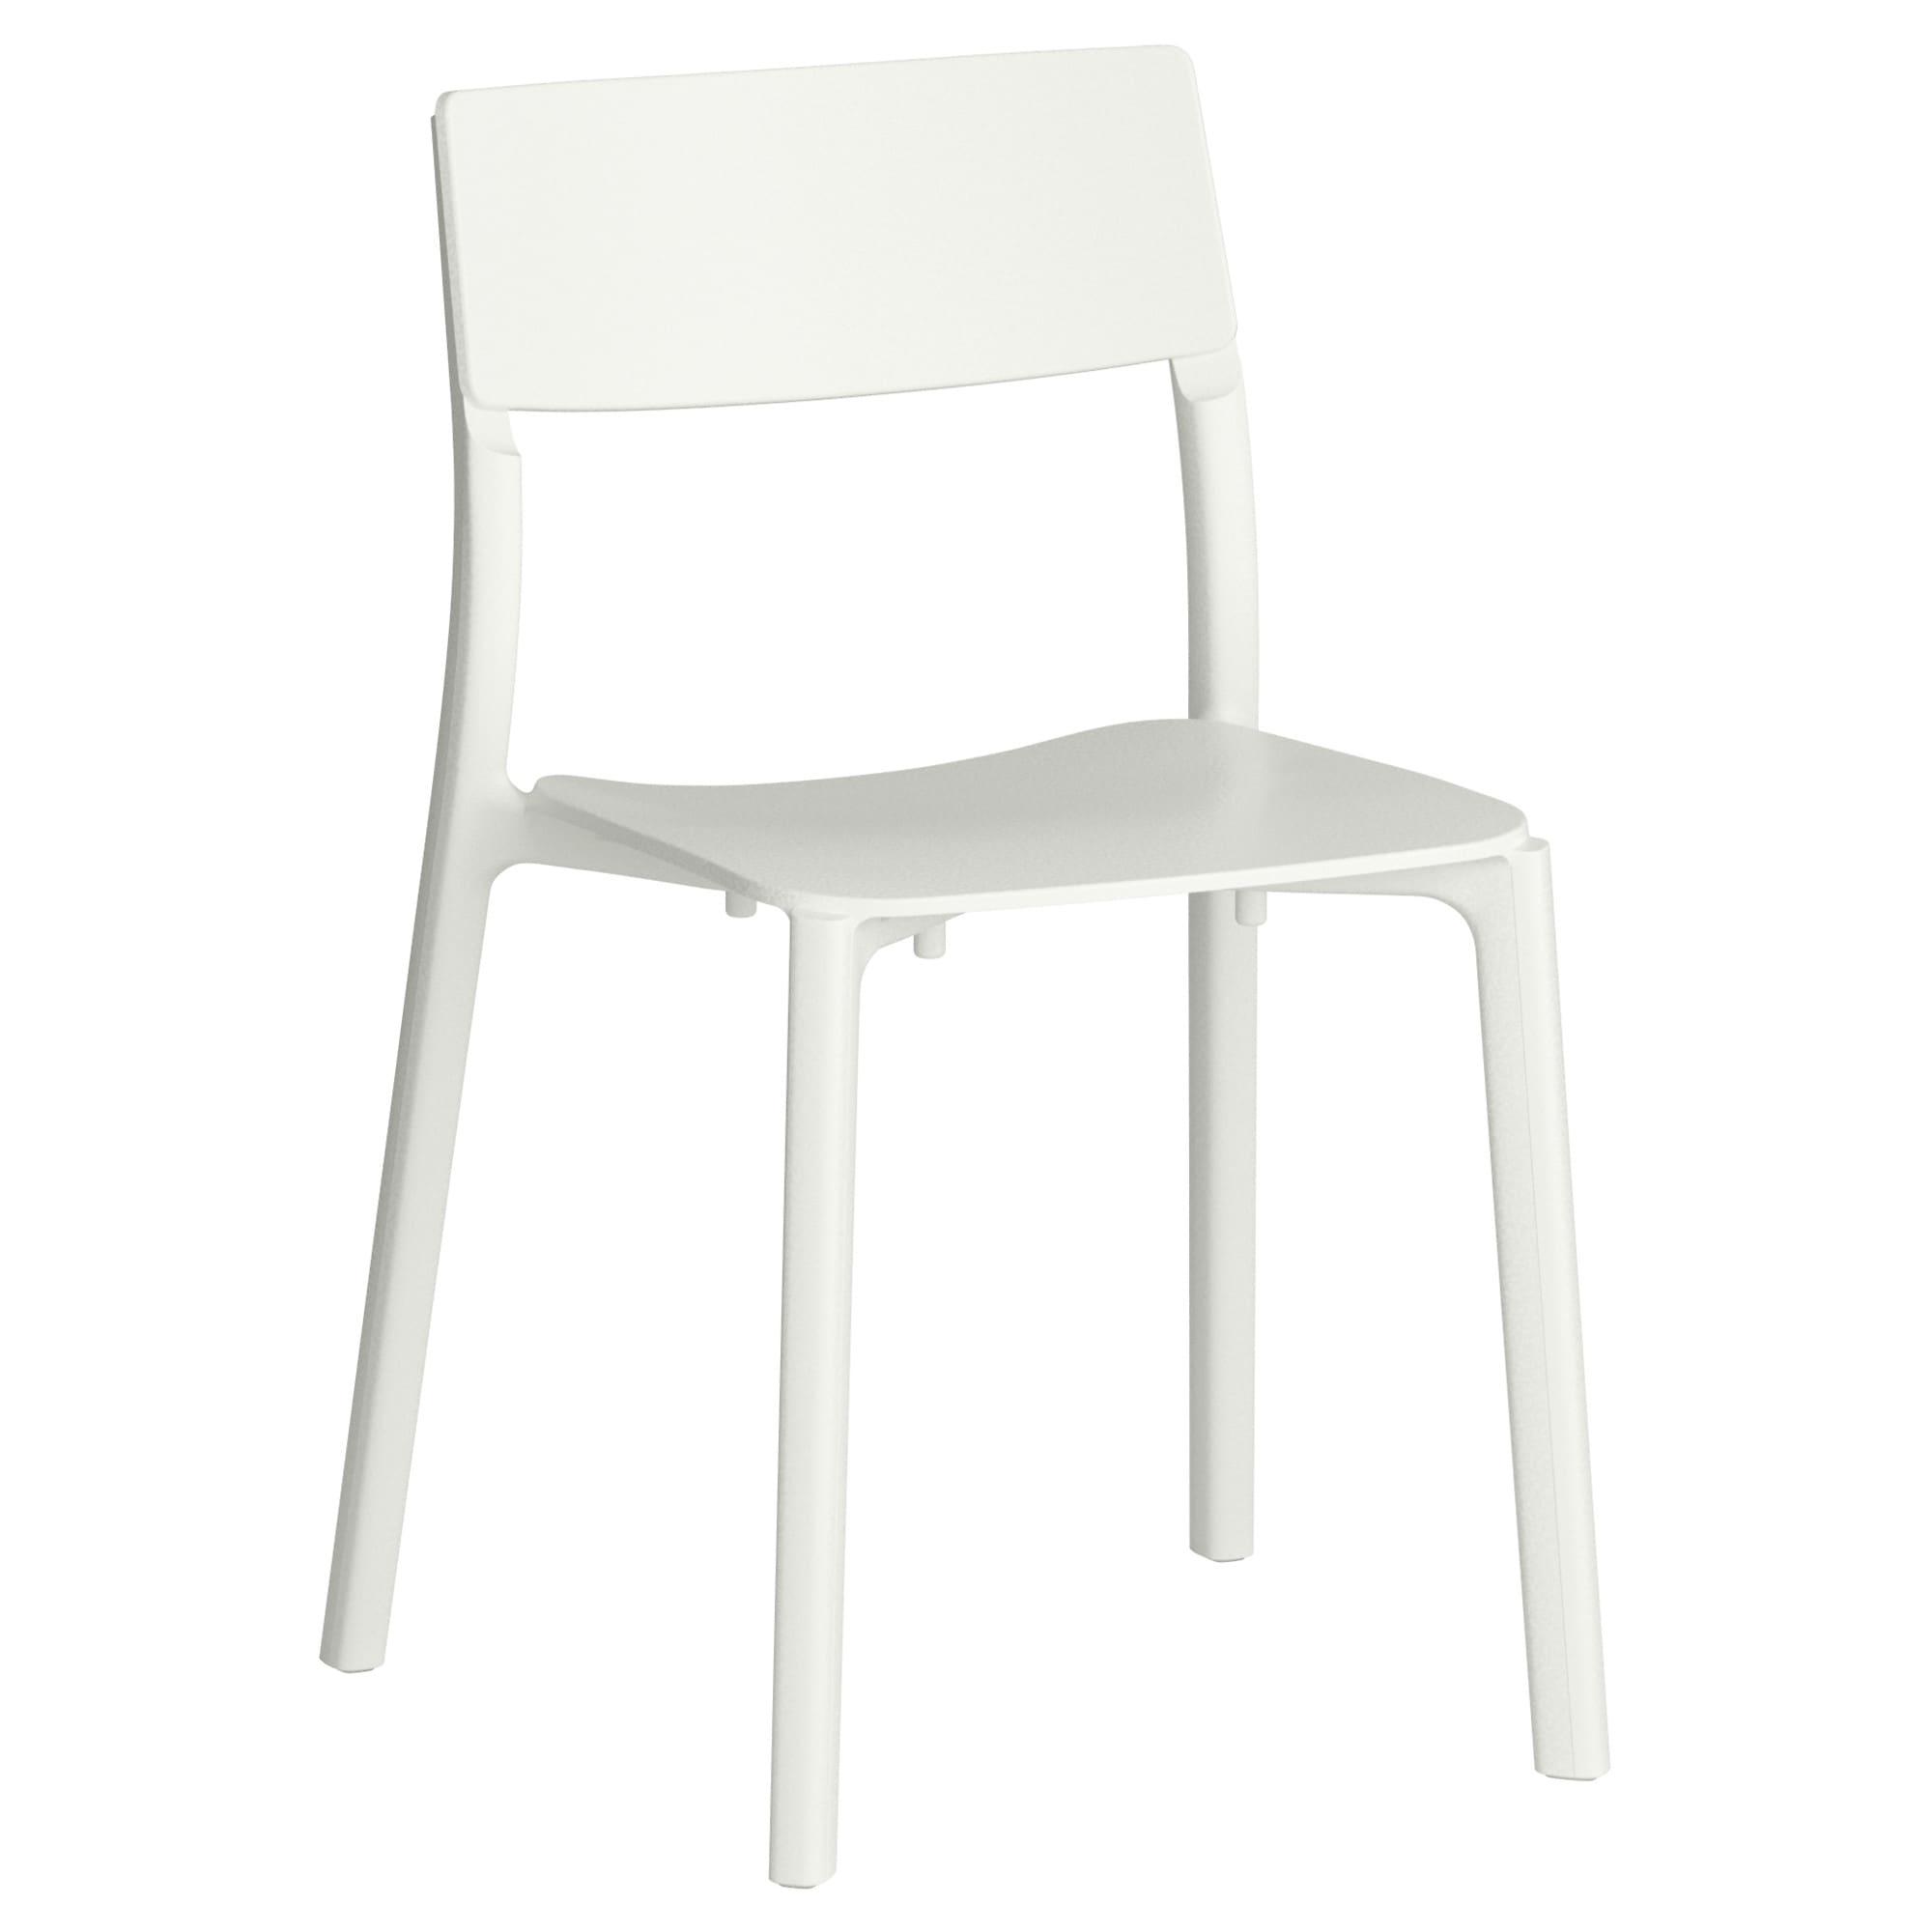 Sillas De Plastico Ikea H9d9 Janinge Silla Blanco Ikea